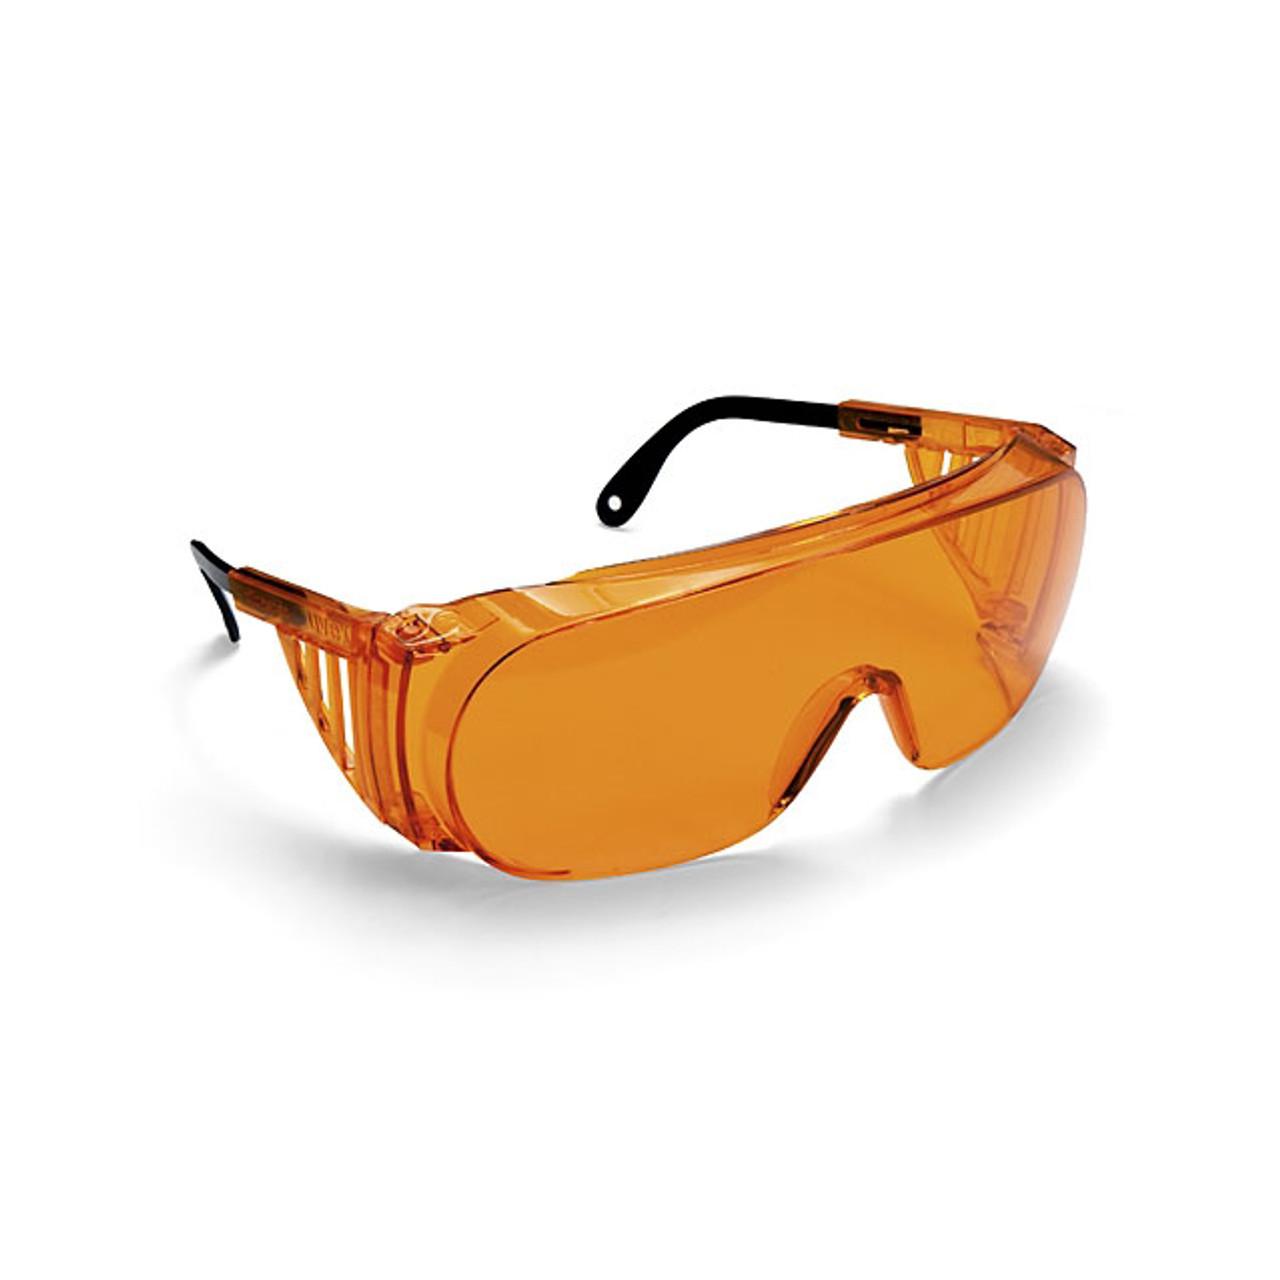 5b06e3c65294 Fit over UVEX Blue Light Blocking Glasses